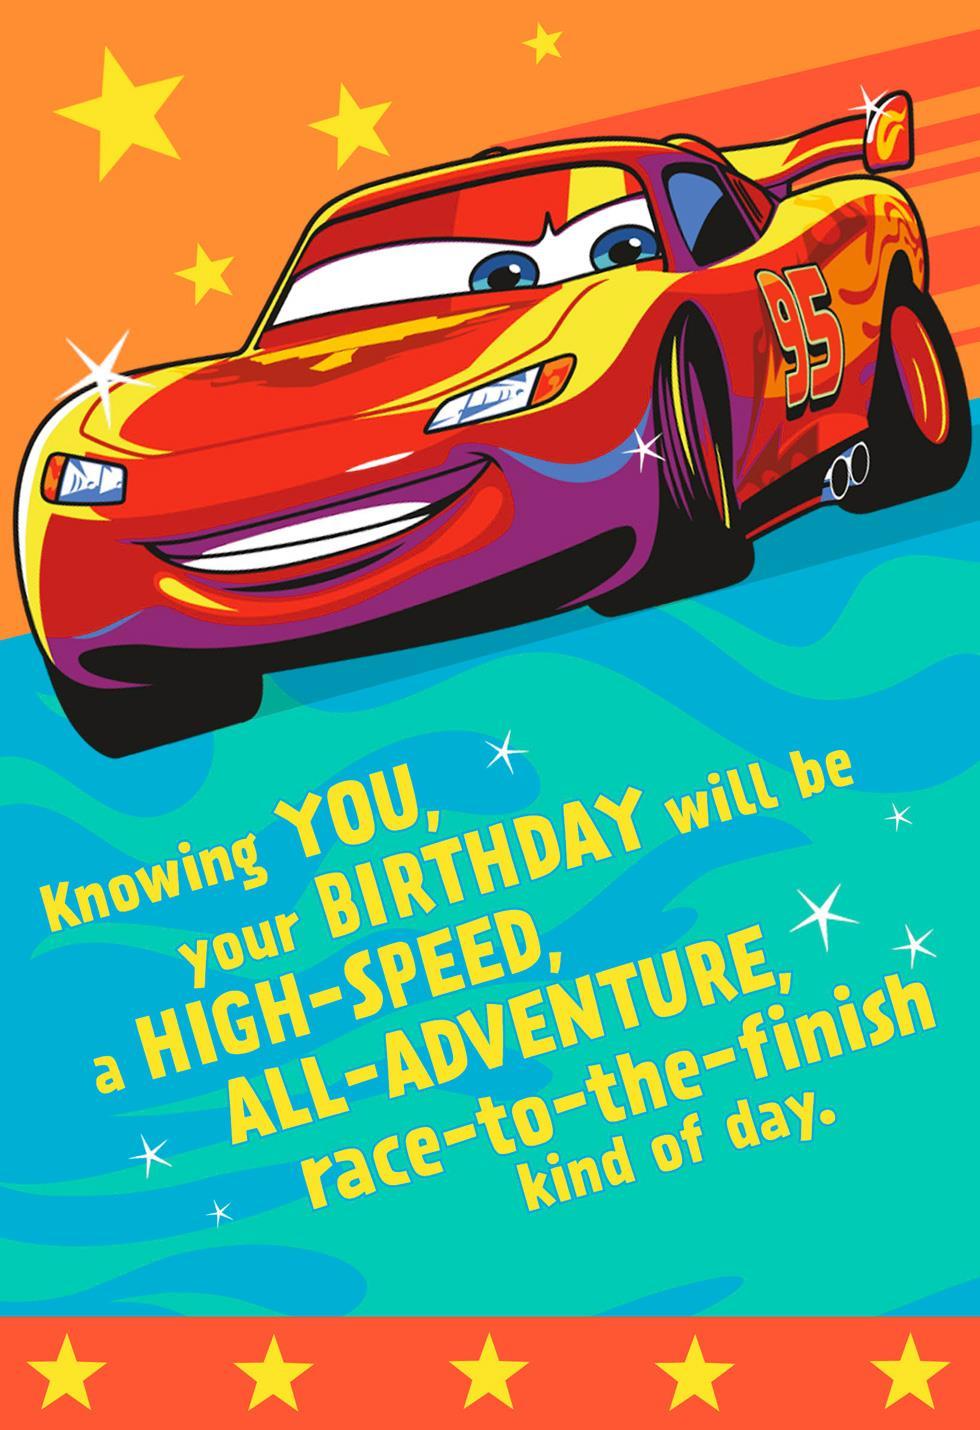 Disney pixar cars lightning mcqueen winner birthday sound card